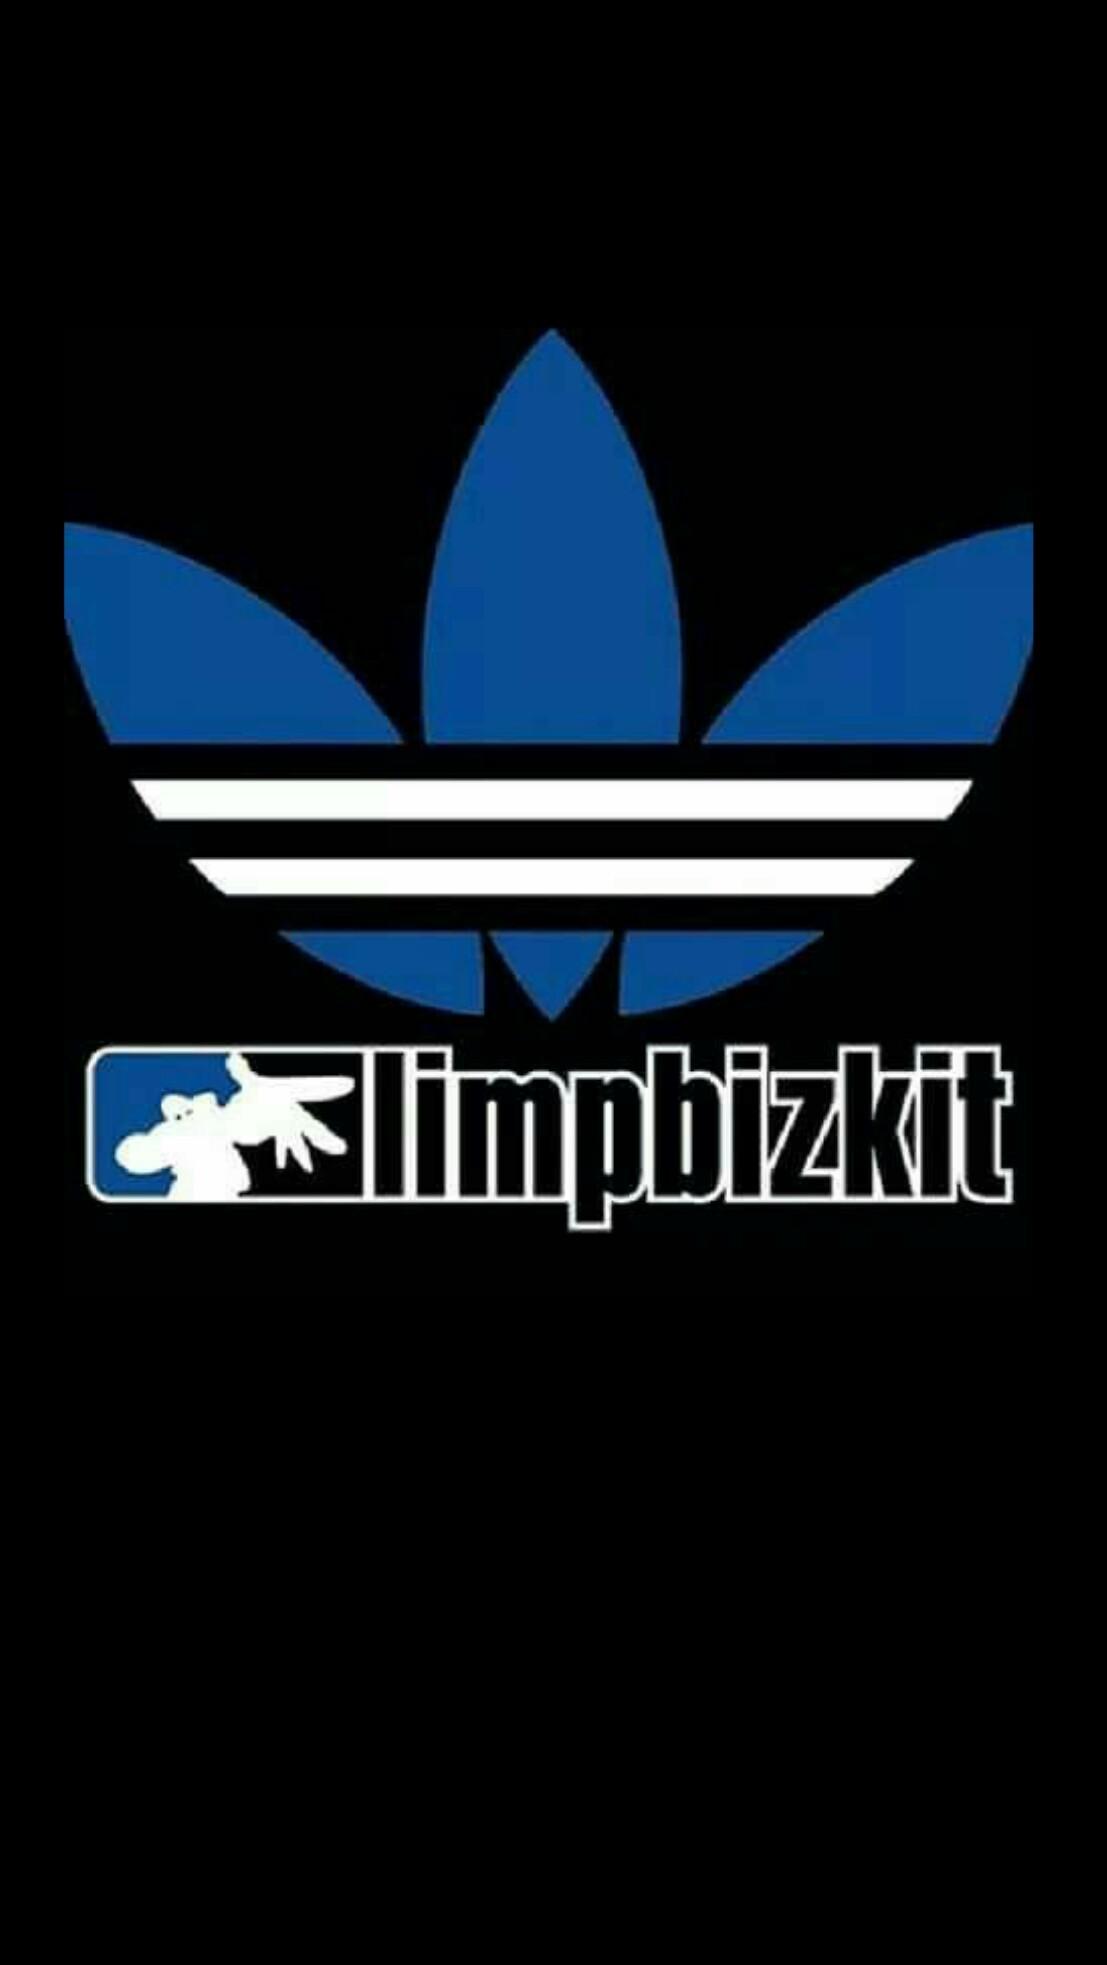 Adidas Logo Hd Wallpaper 4k Wallpaper Collections